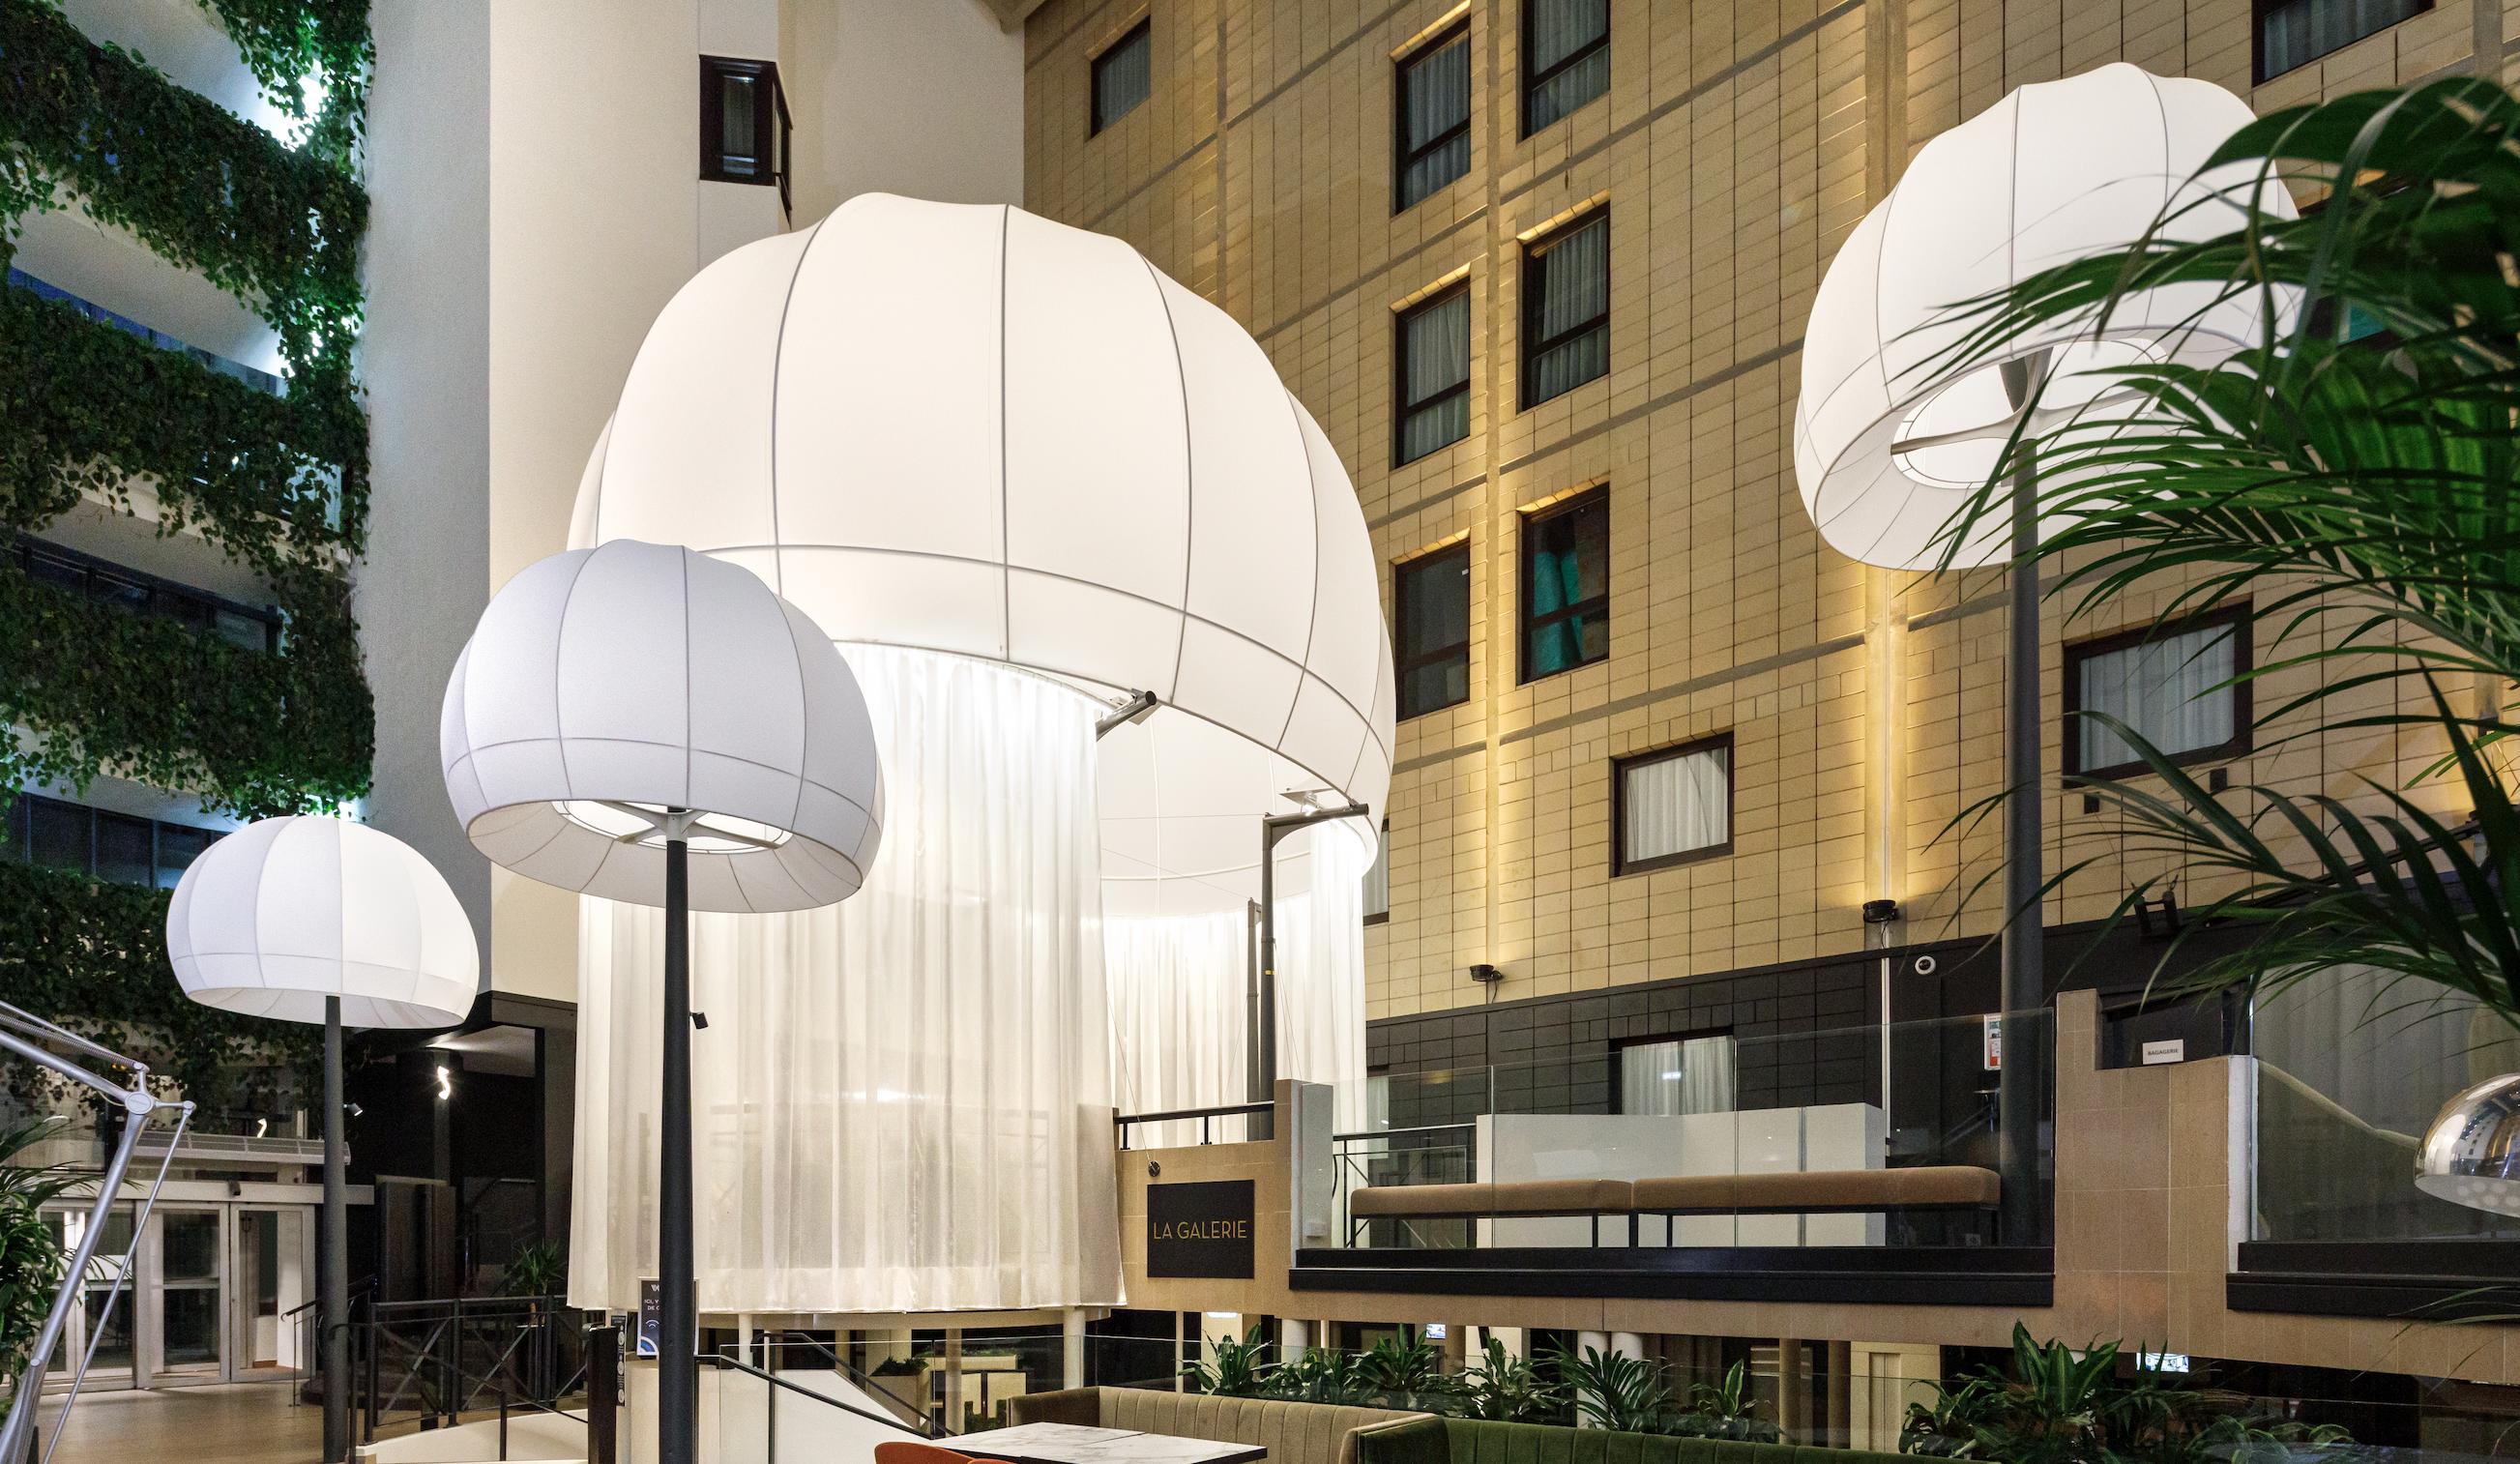 Luminaire hotel hopfab